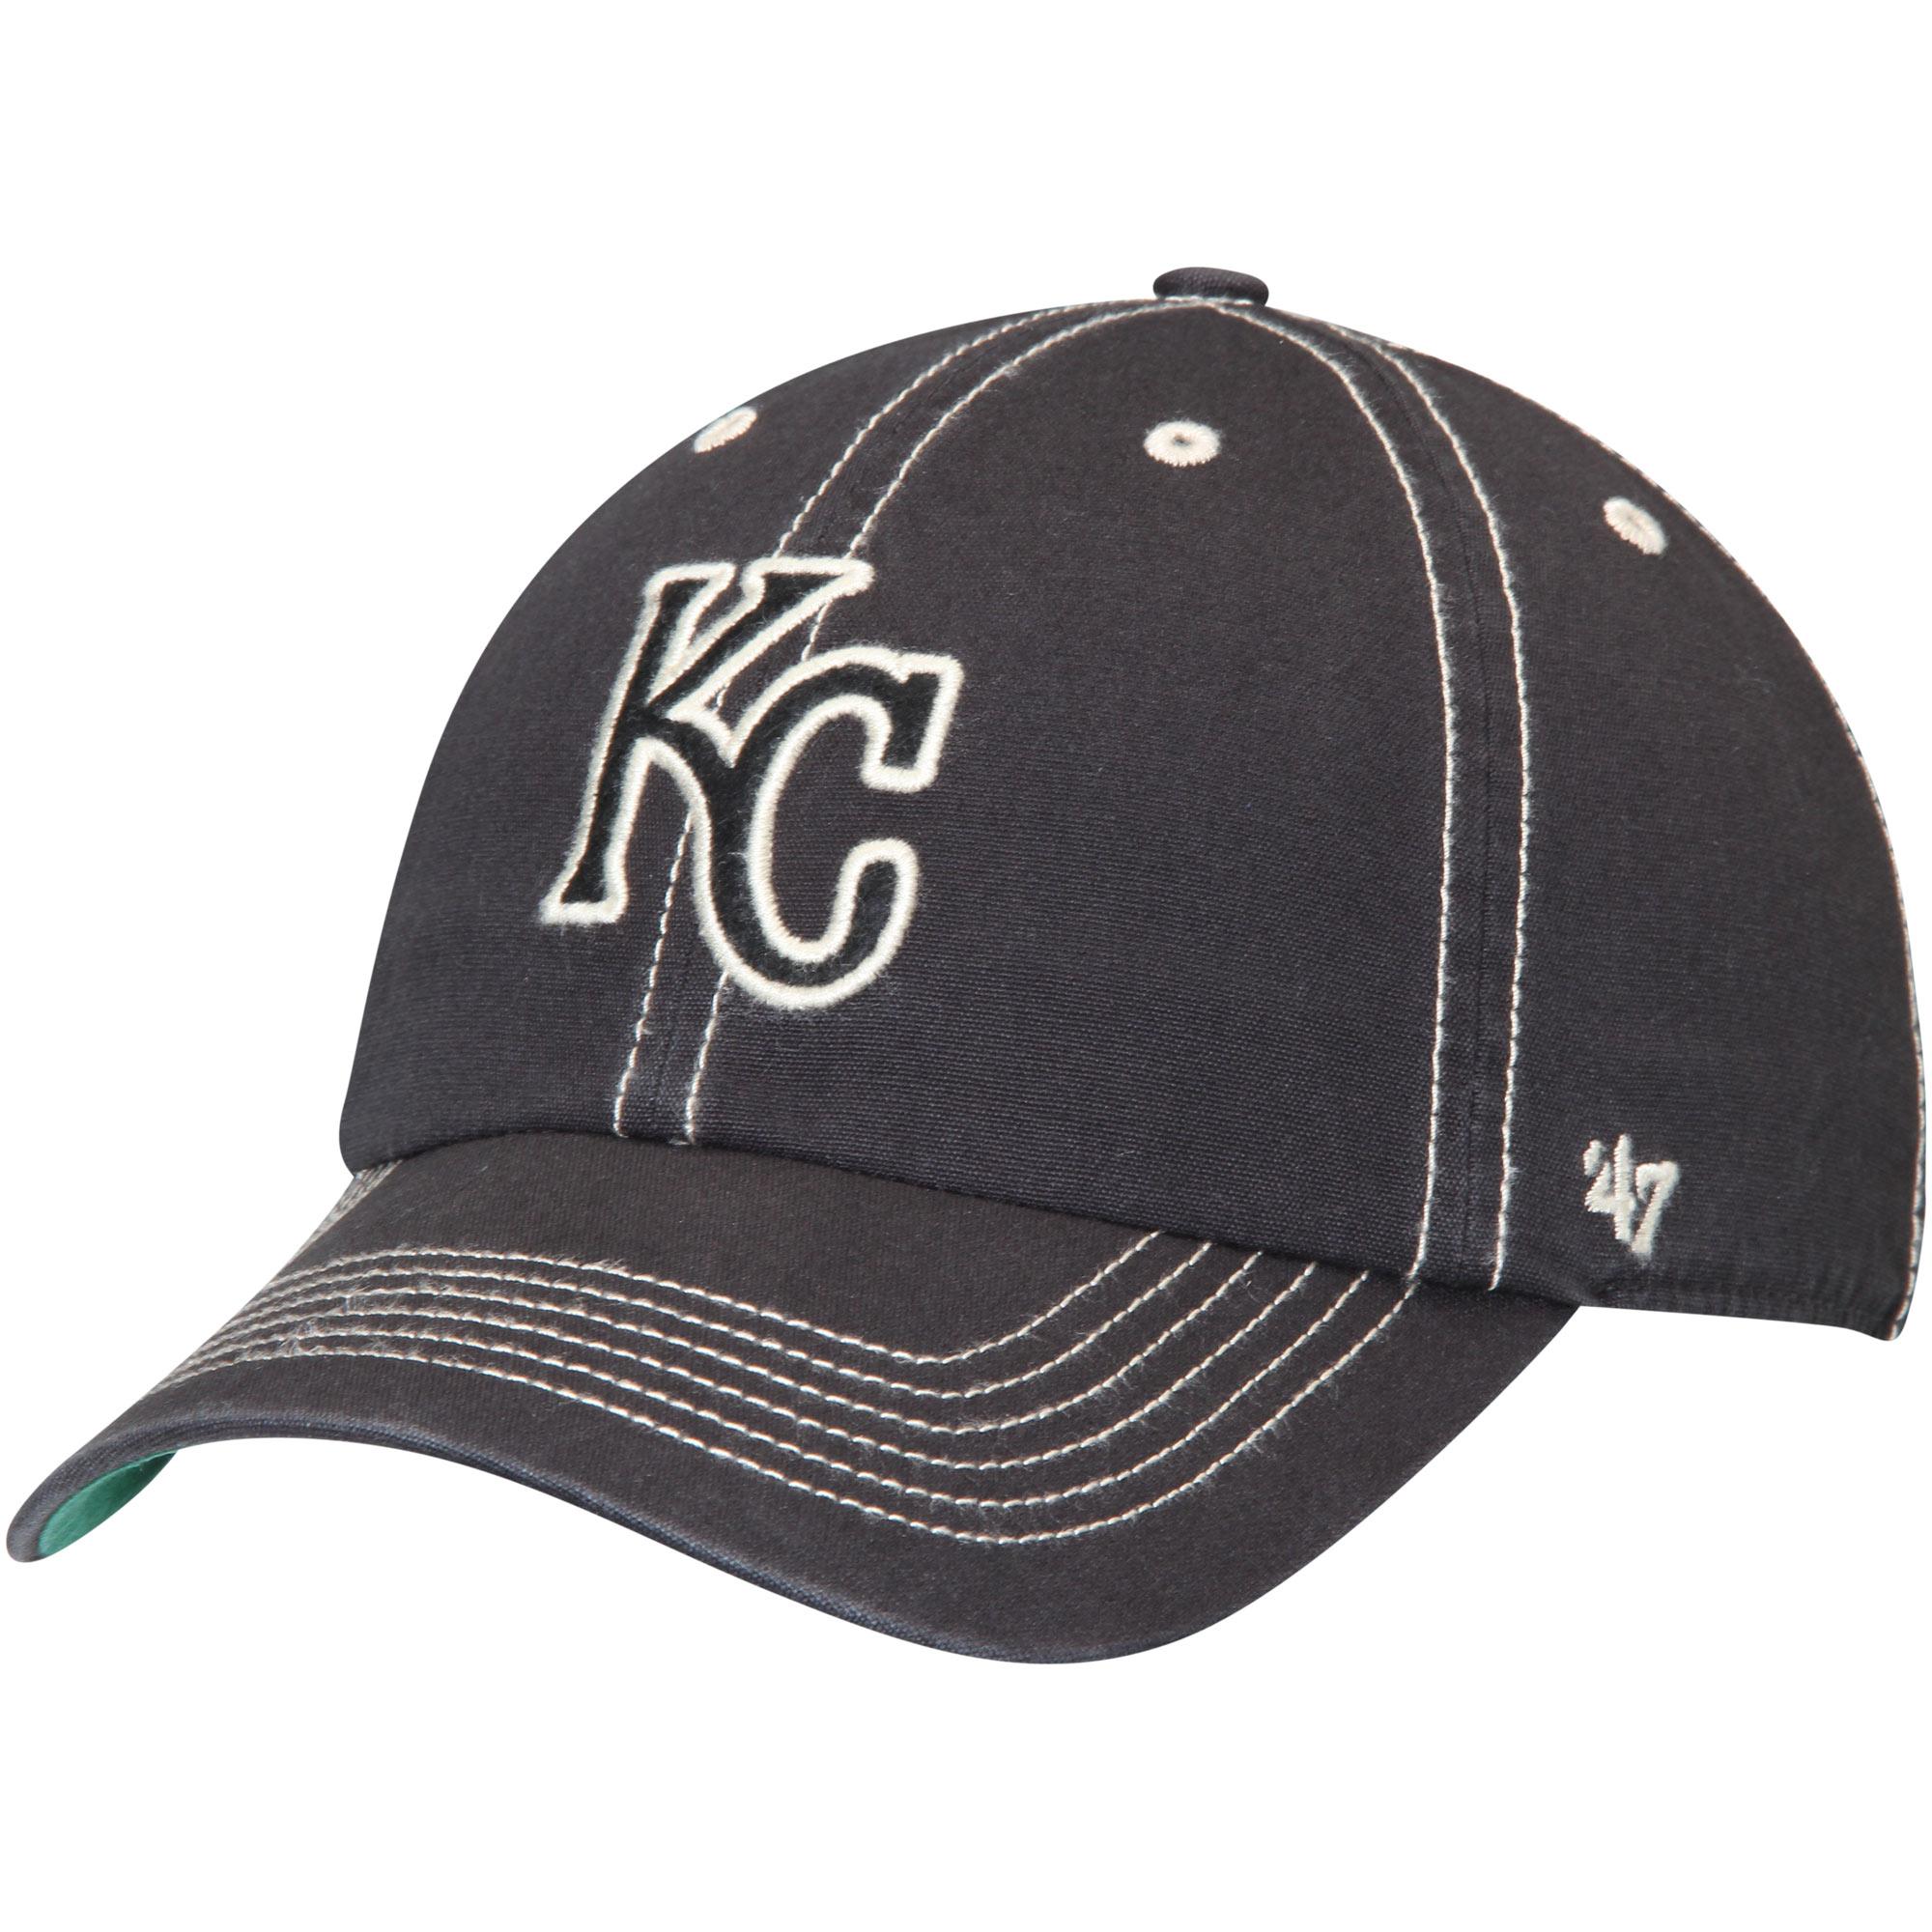 Kansas City Royals '47 Groveland Franchise Fitted Hat - Black